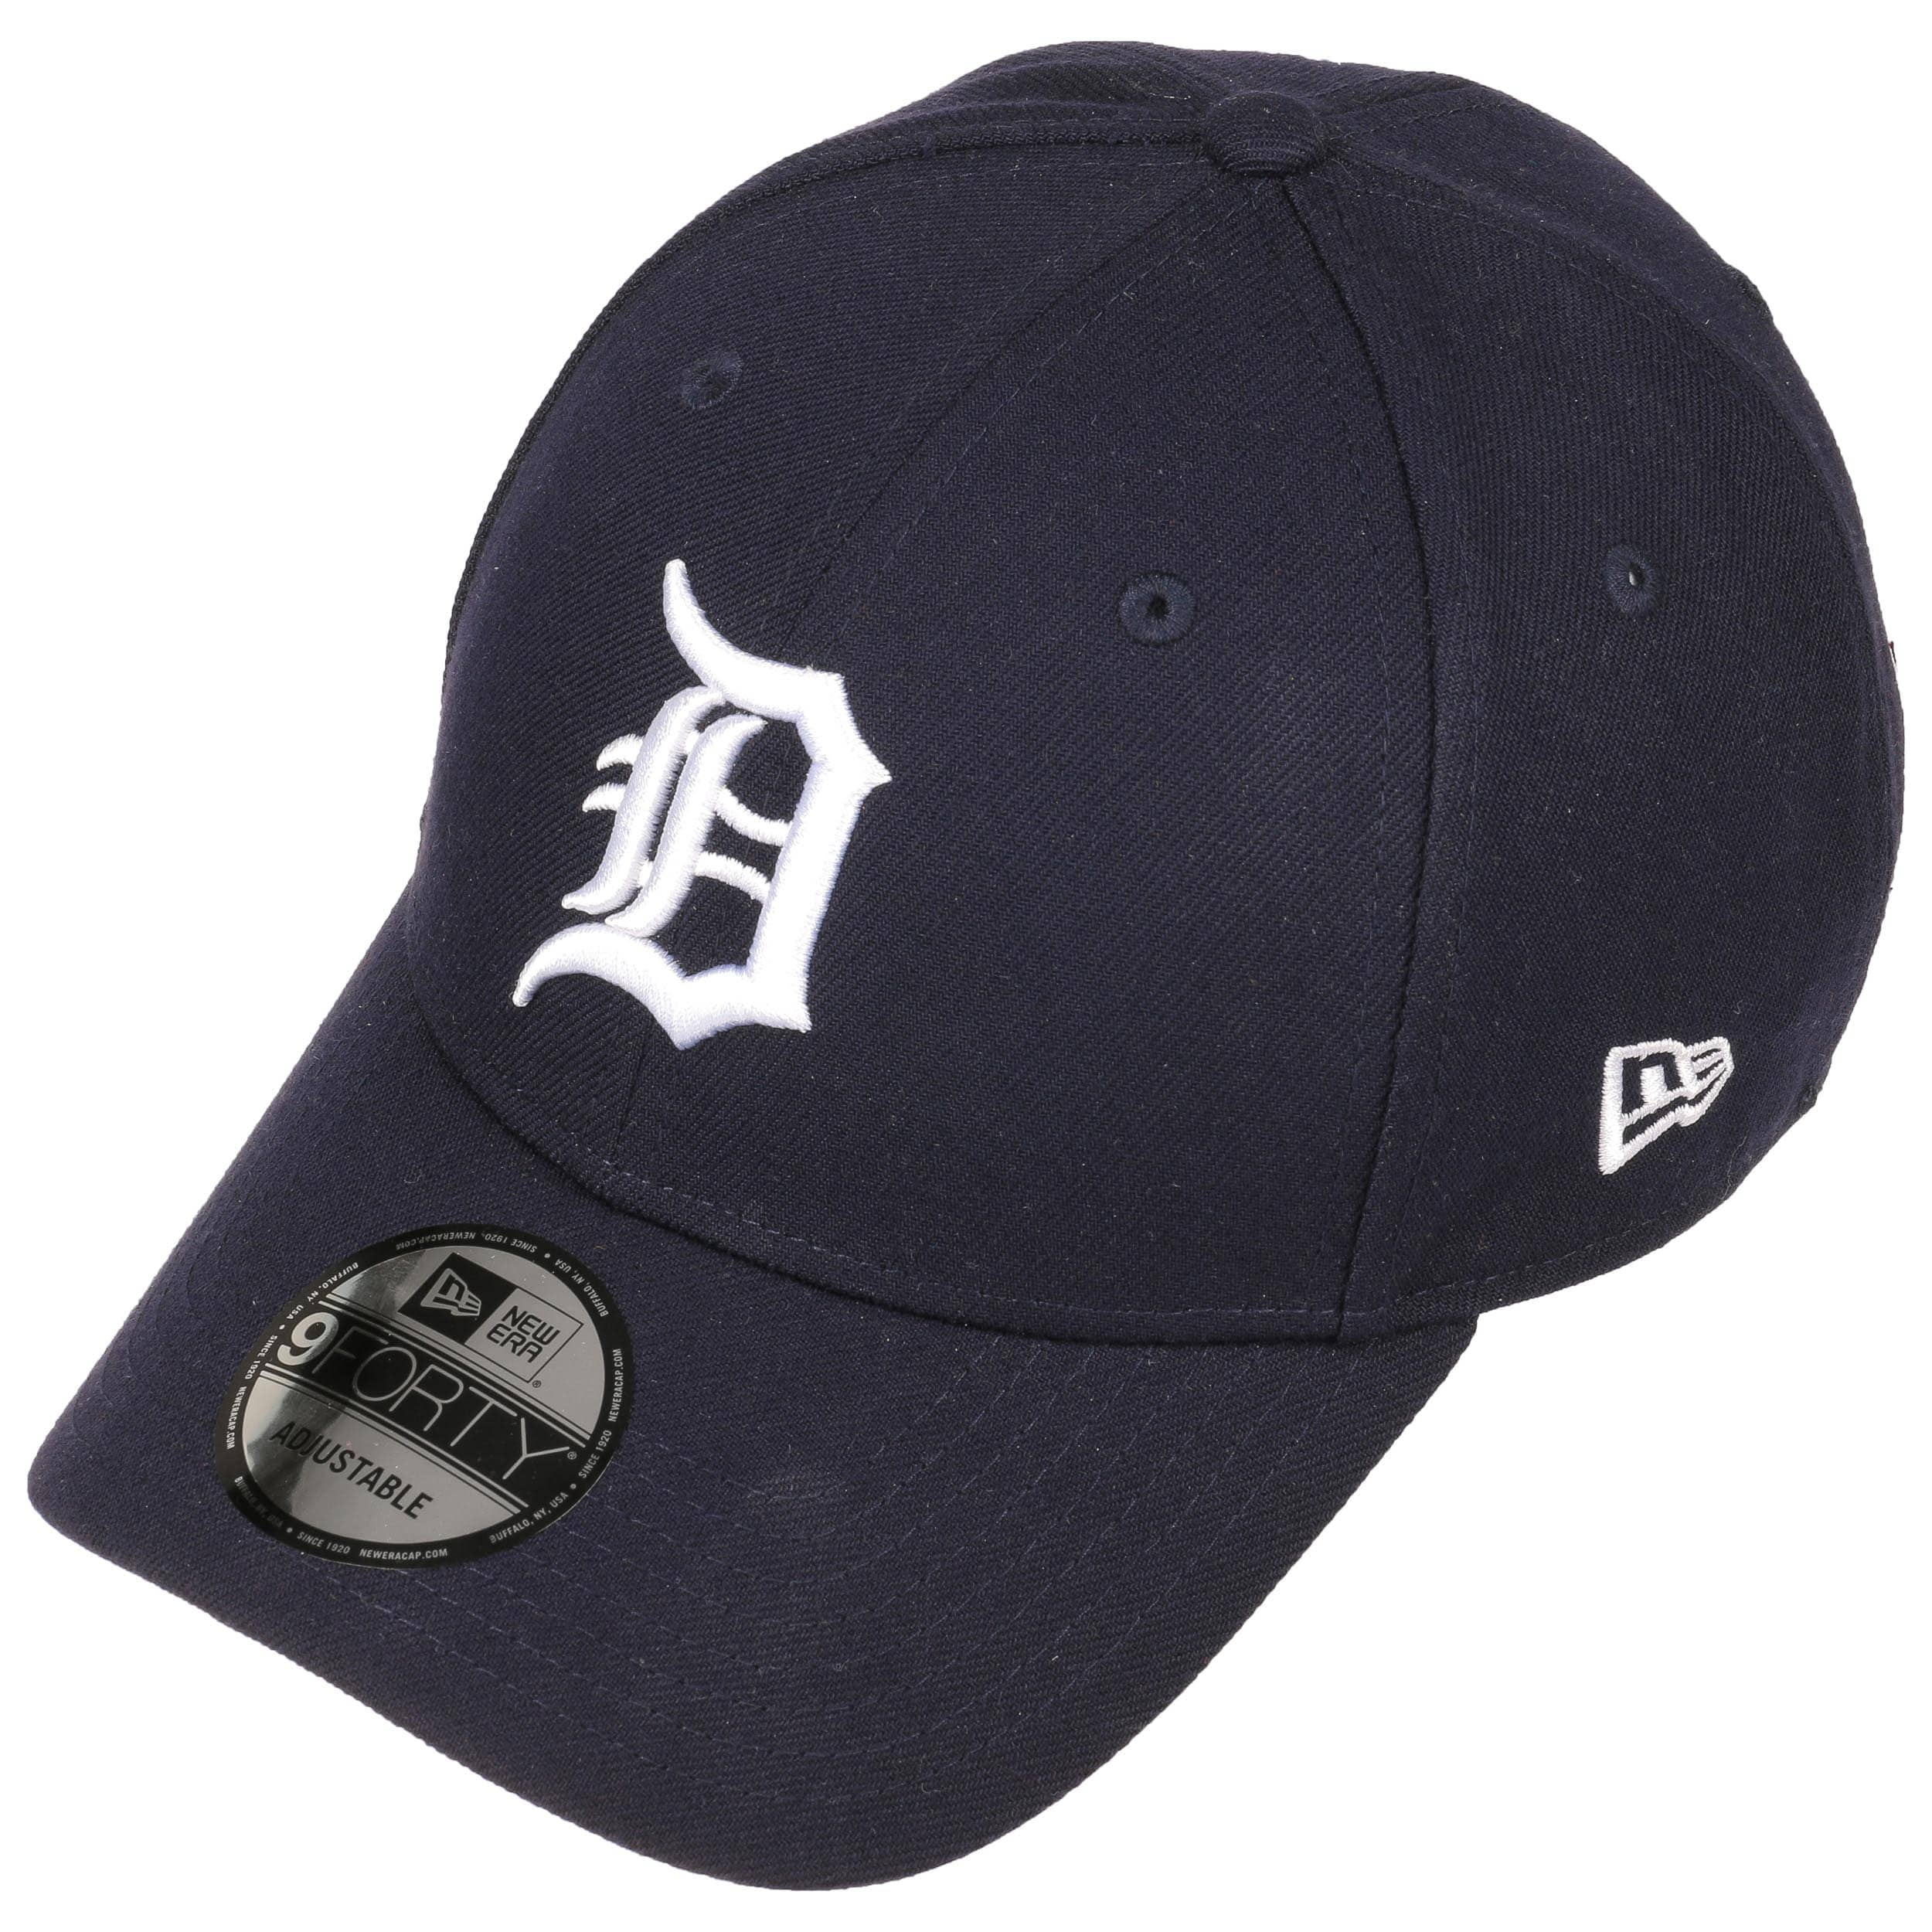 Gorra 9Forty Detroit Tigers by New Era - Gorras - sombreroshop.es 87cd8487ae8